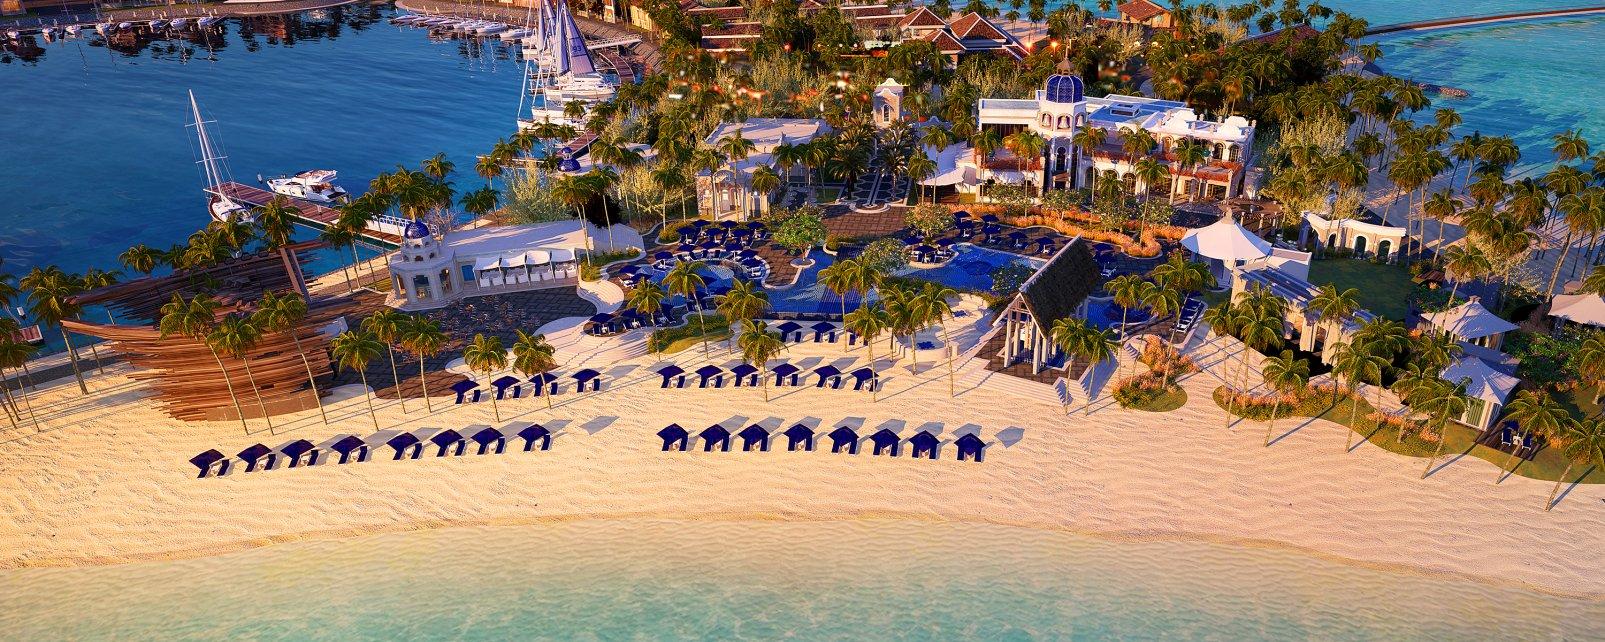 Hôtel Saii Lagoon Maldives Curio Collection by Hilton